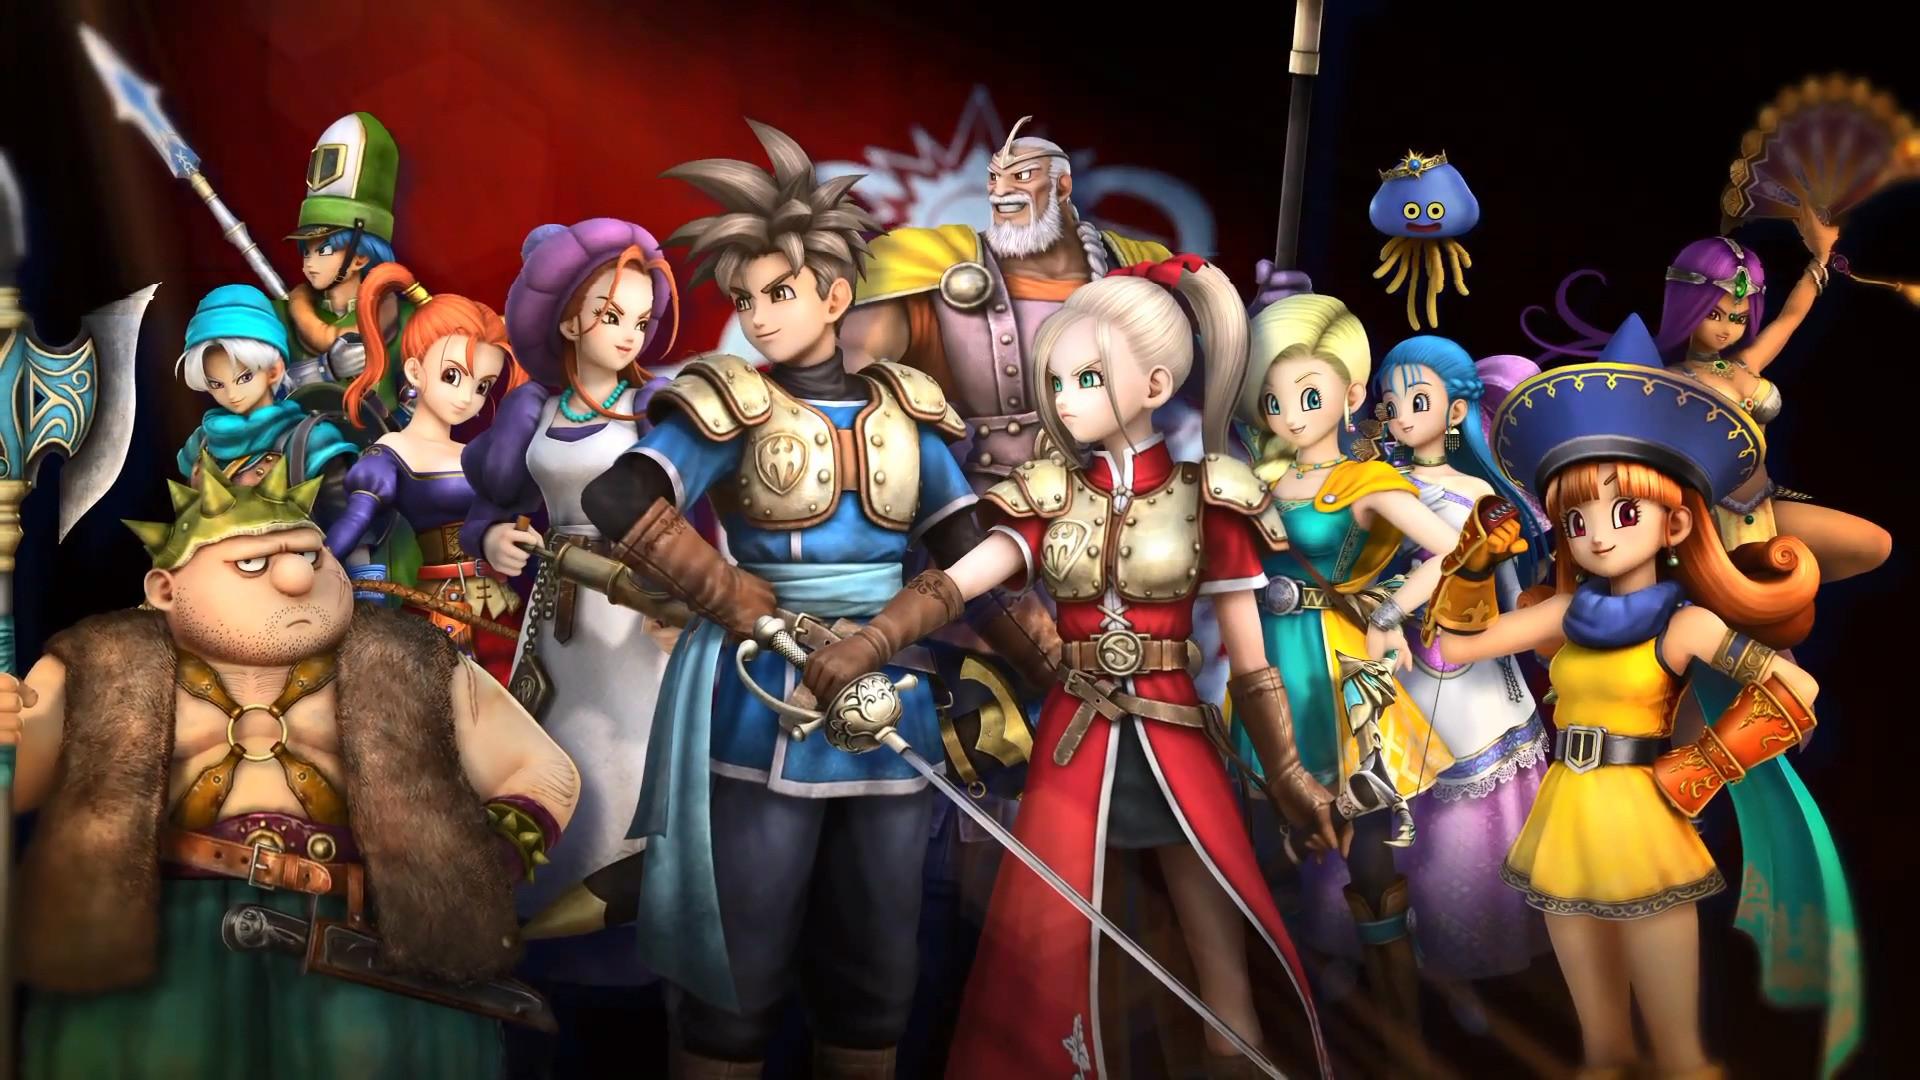 Dragon Quest Heroes Wallpaper (97+ images)